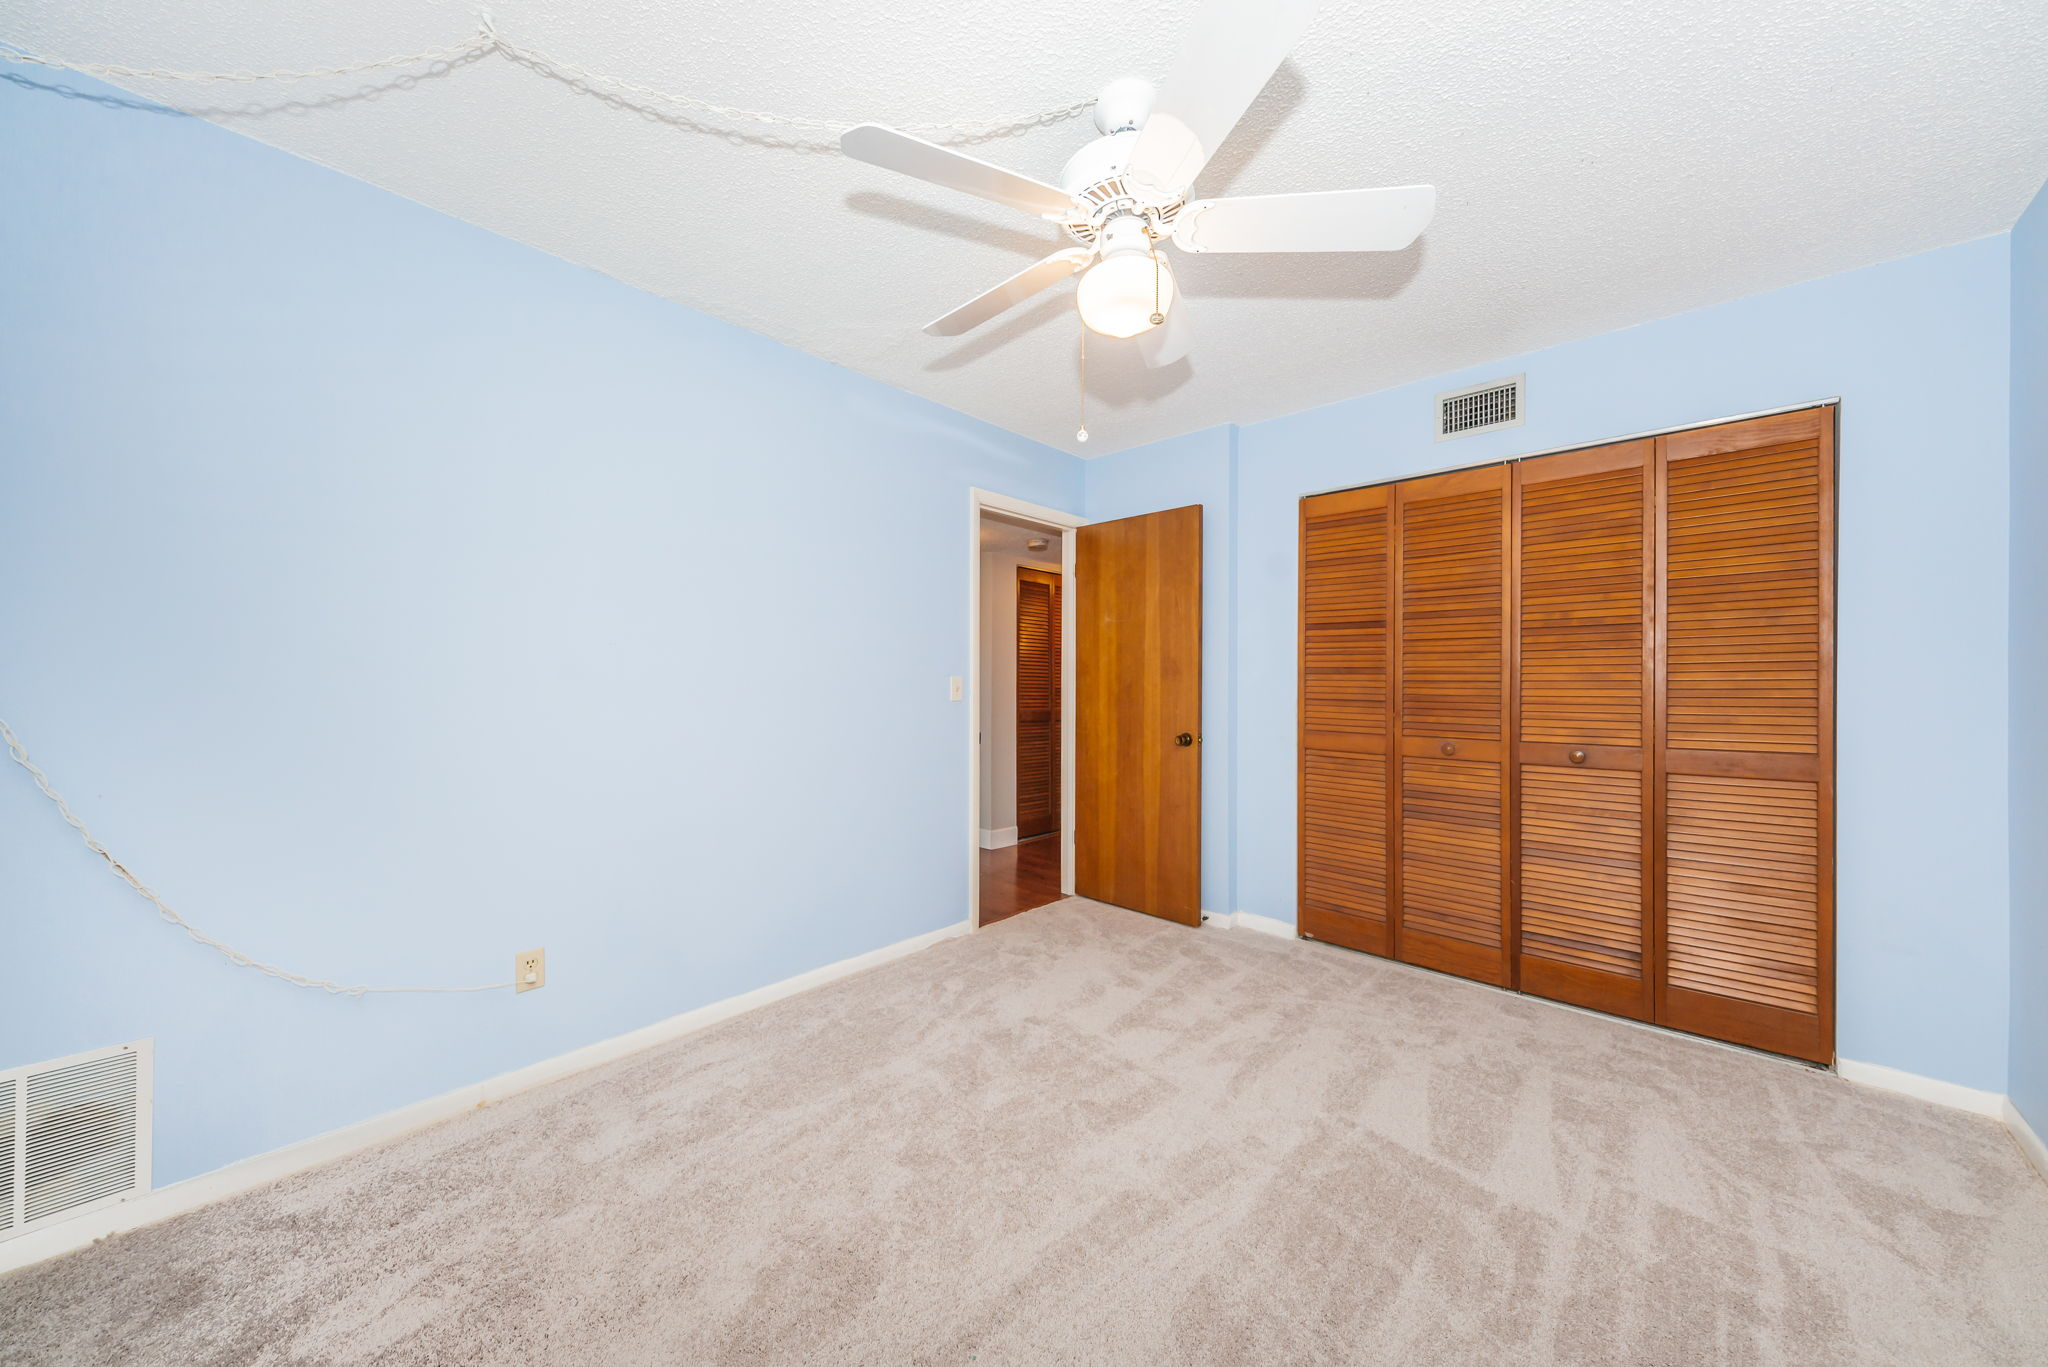 Bedroom2b-2